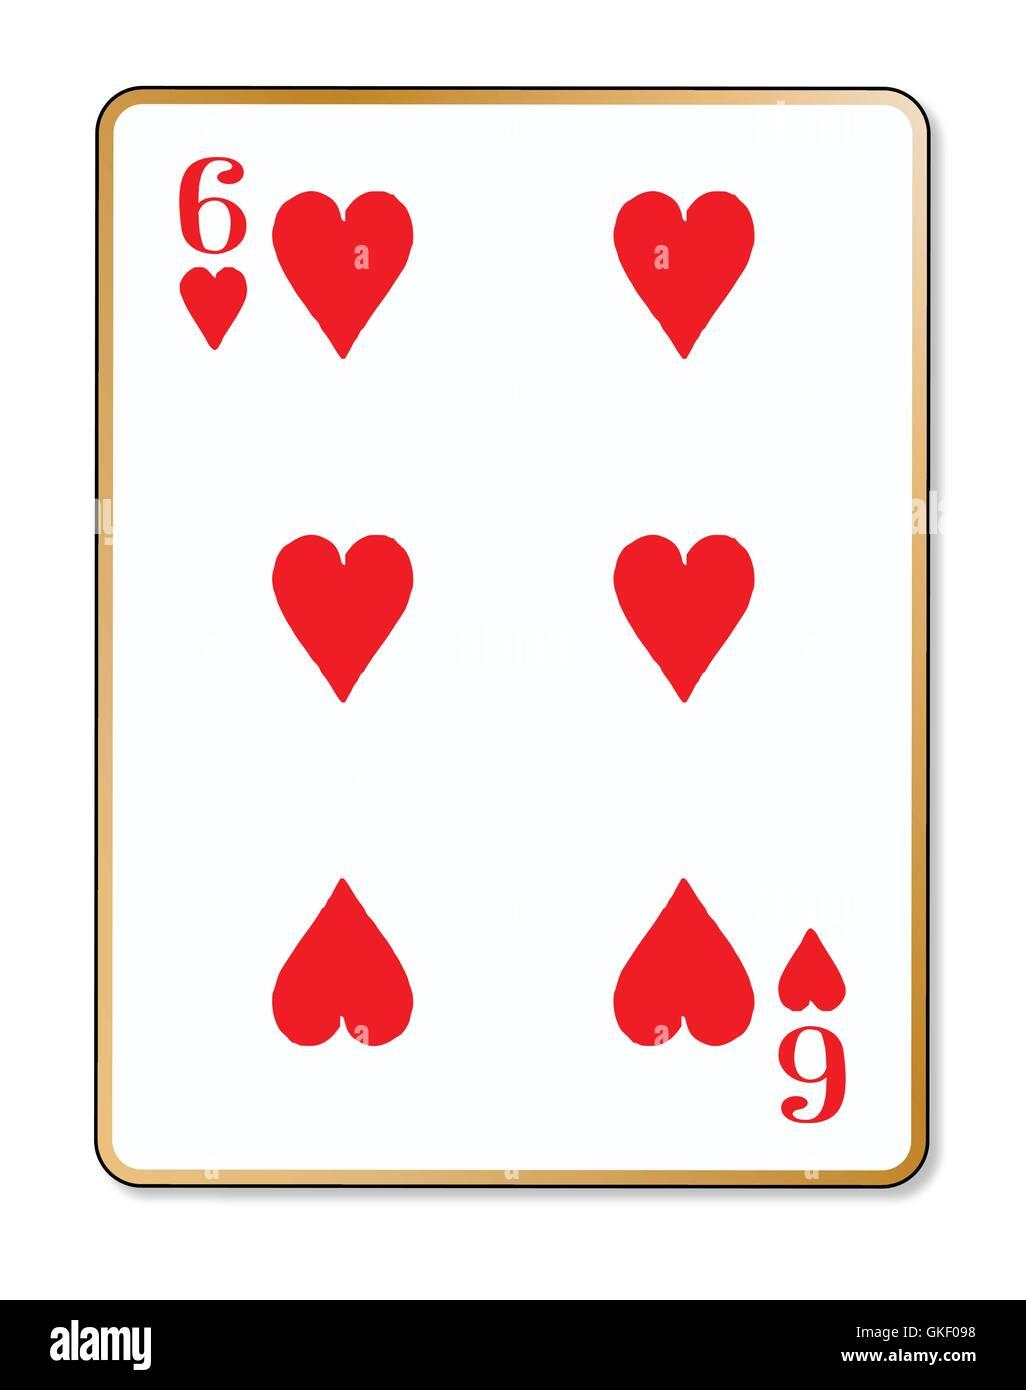 Six of Hearts